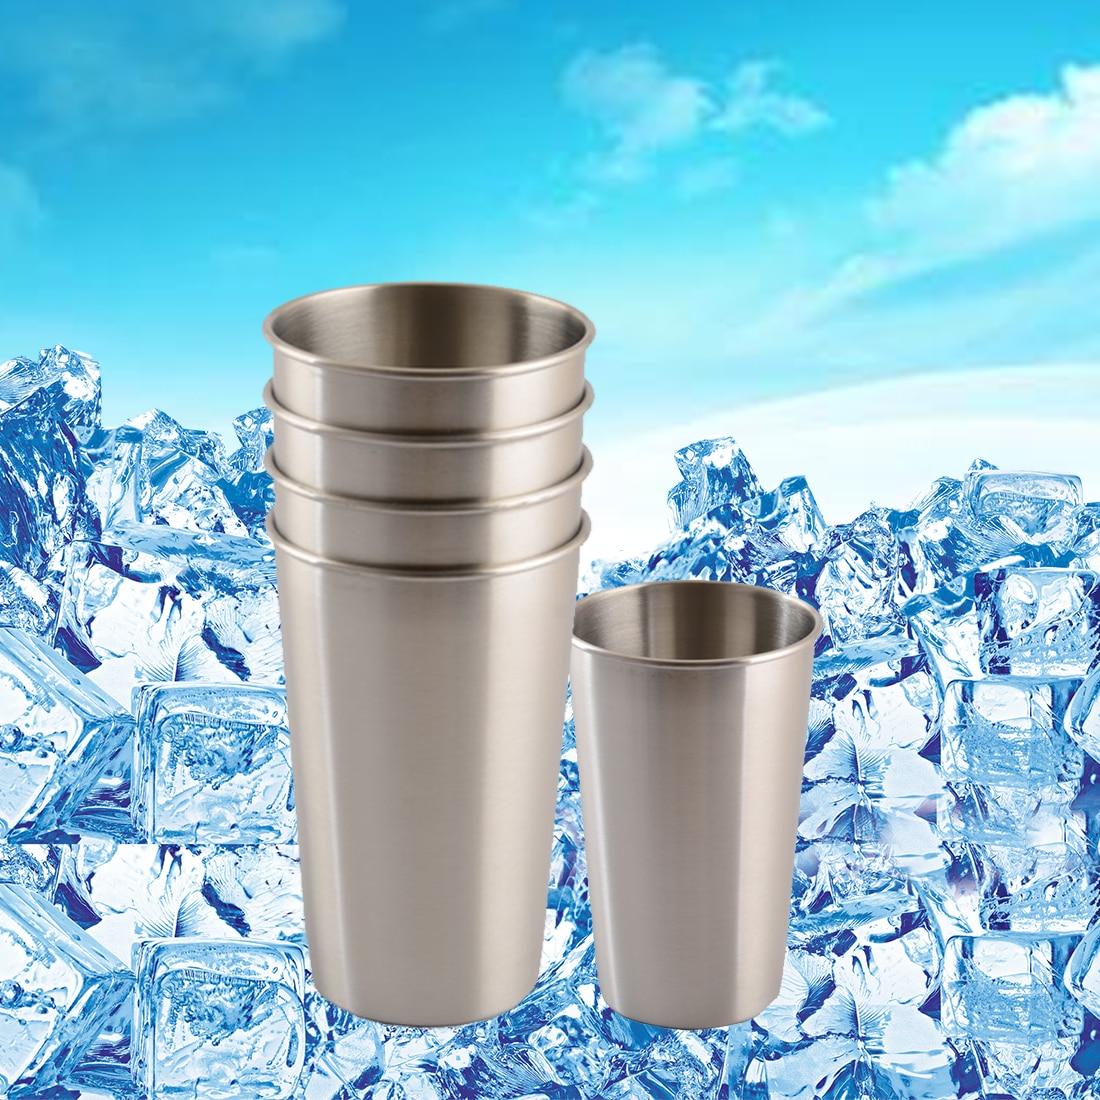 500ml 304 Stainless Steel Wine Cups Drinking Liquor Alcohol Whisky Vodka Bottle Mug Travel Barware Accessories